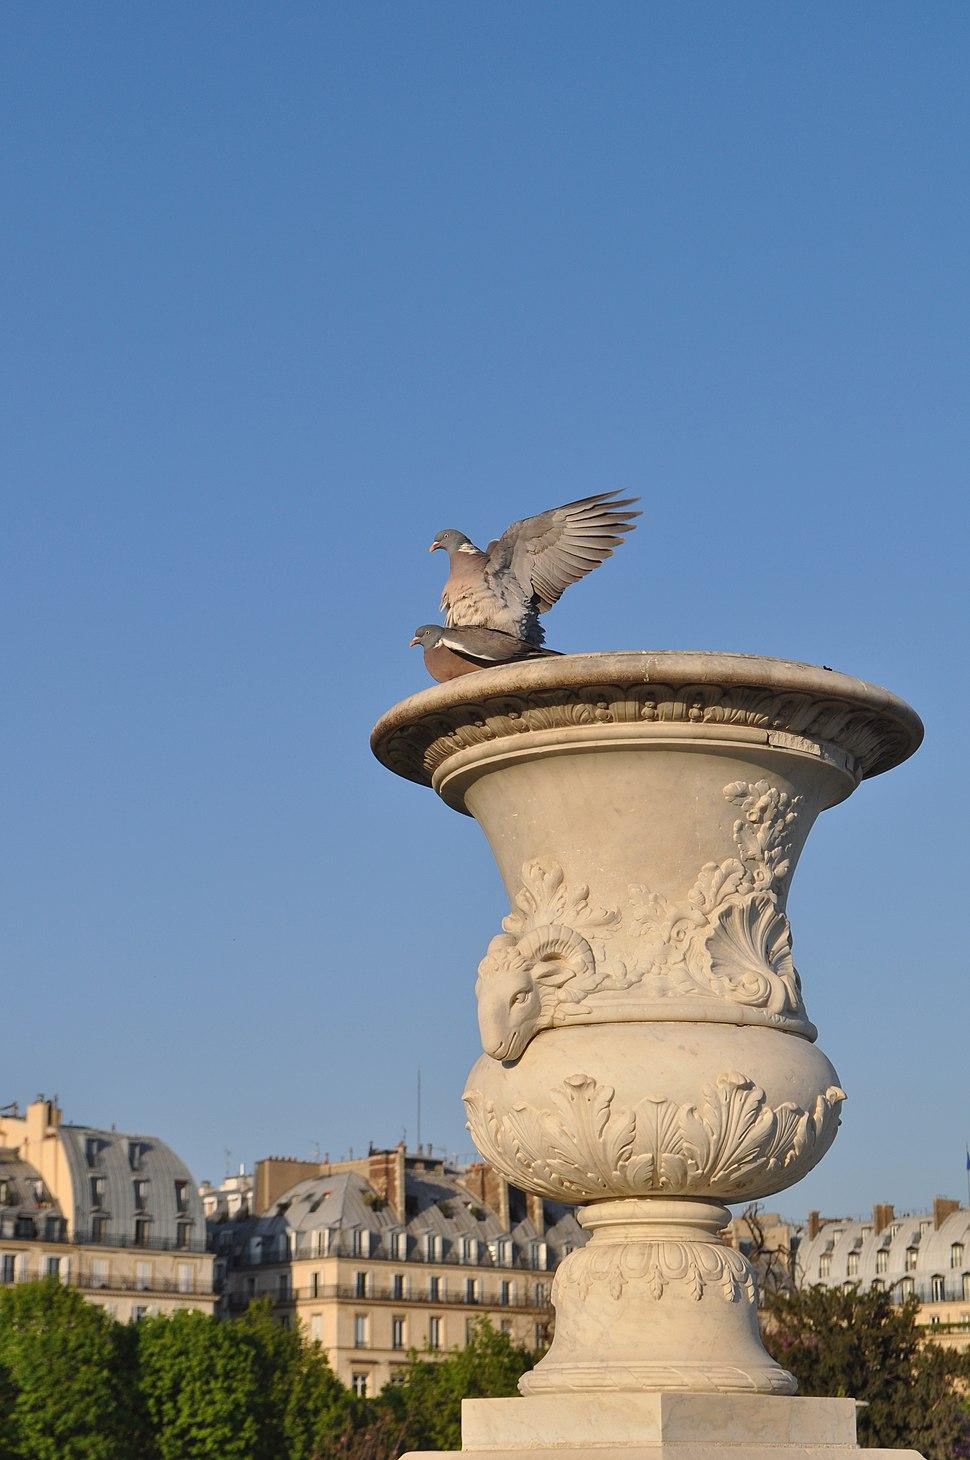 Columba palumbus in Paris